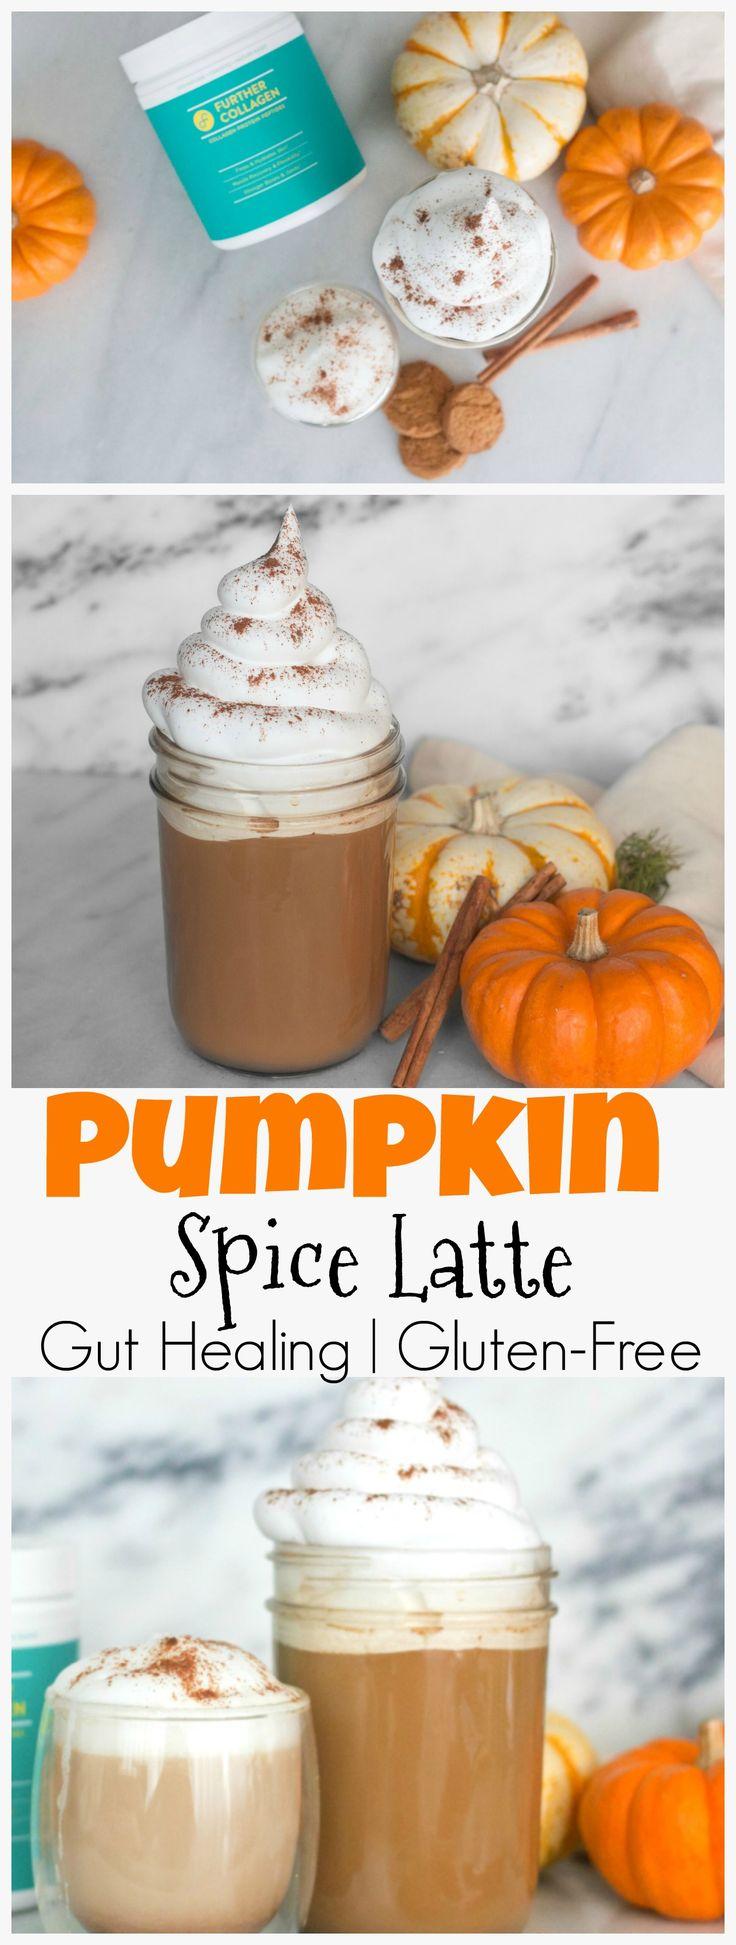 http://www.furtherfood.com/recipe/pumpkin-spice-latte-collagen/